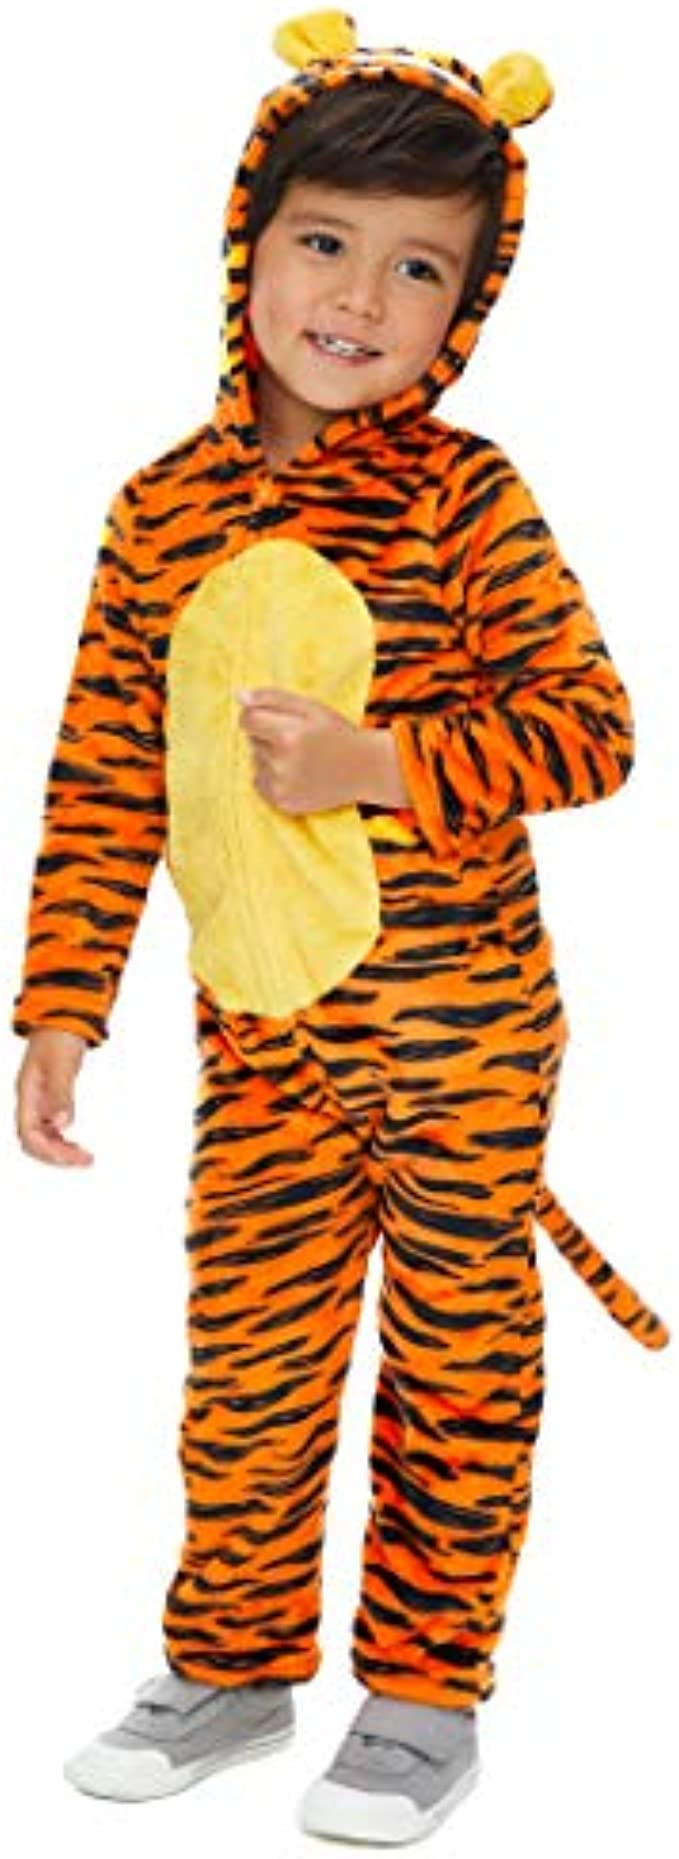 Disney Winnie The Pooh Boys' Fleece Costume Coverall with Hood